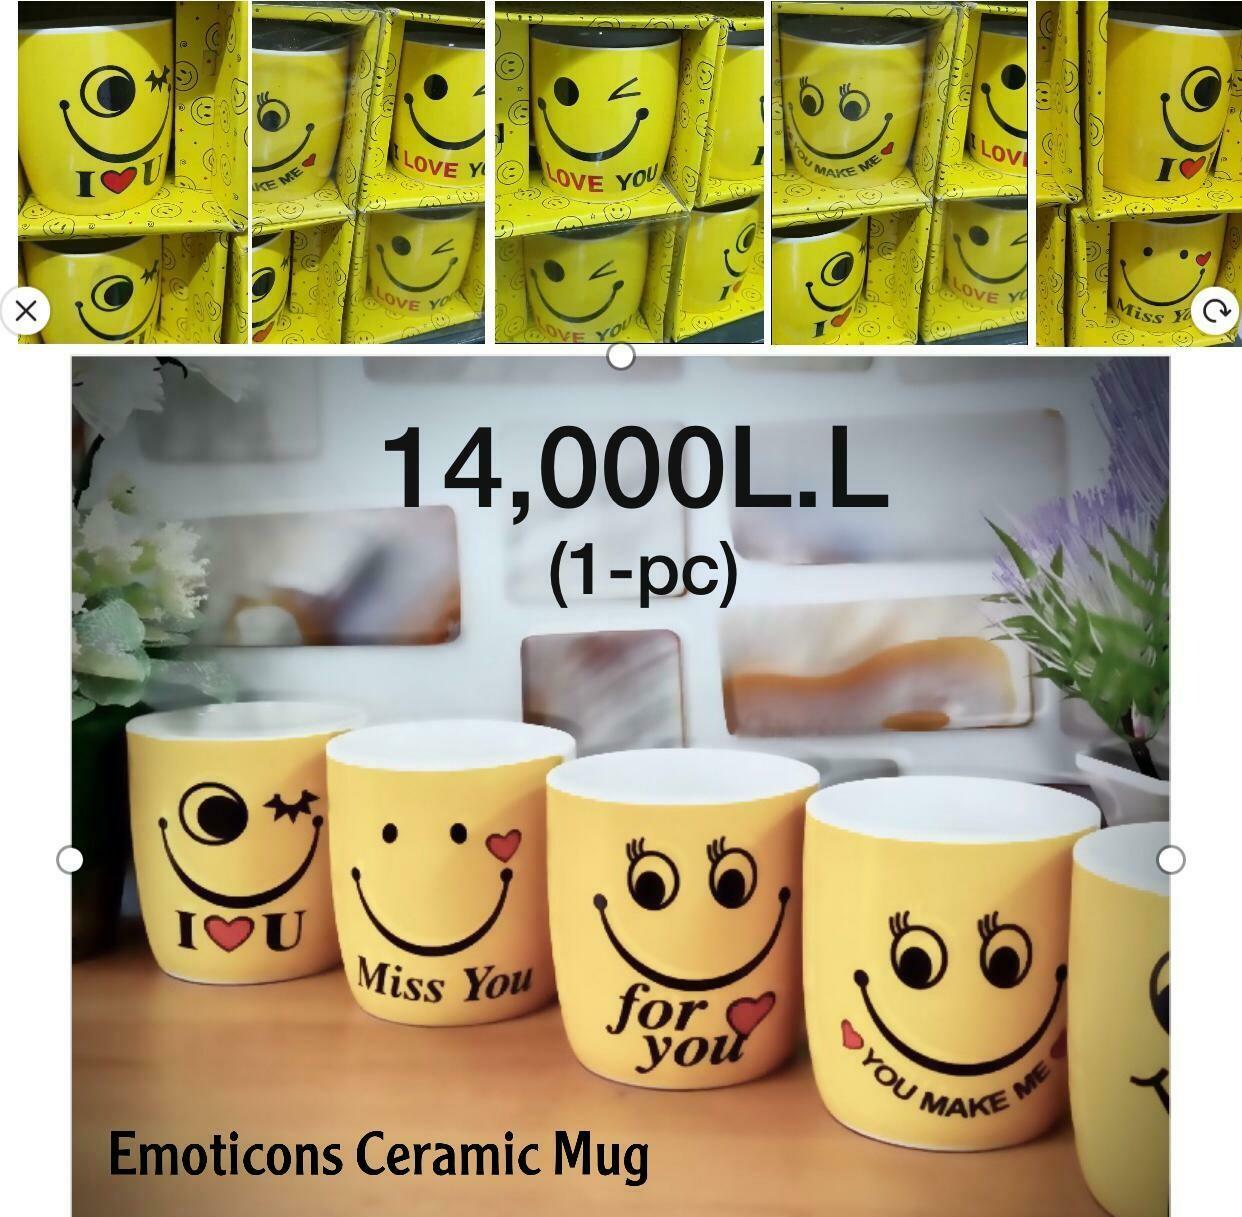 Emoticon Ceramic Mug